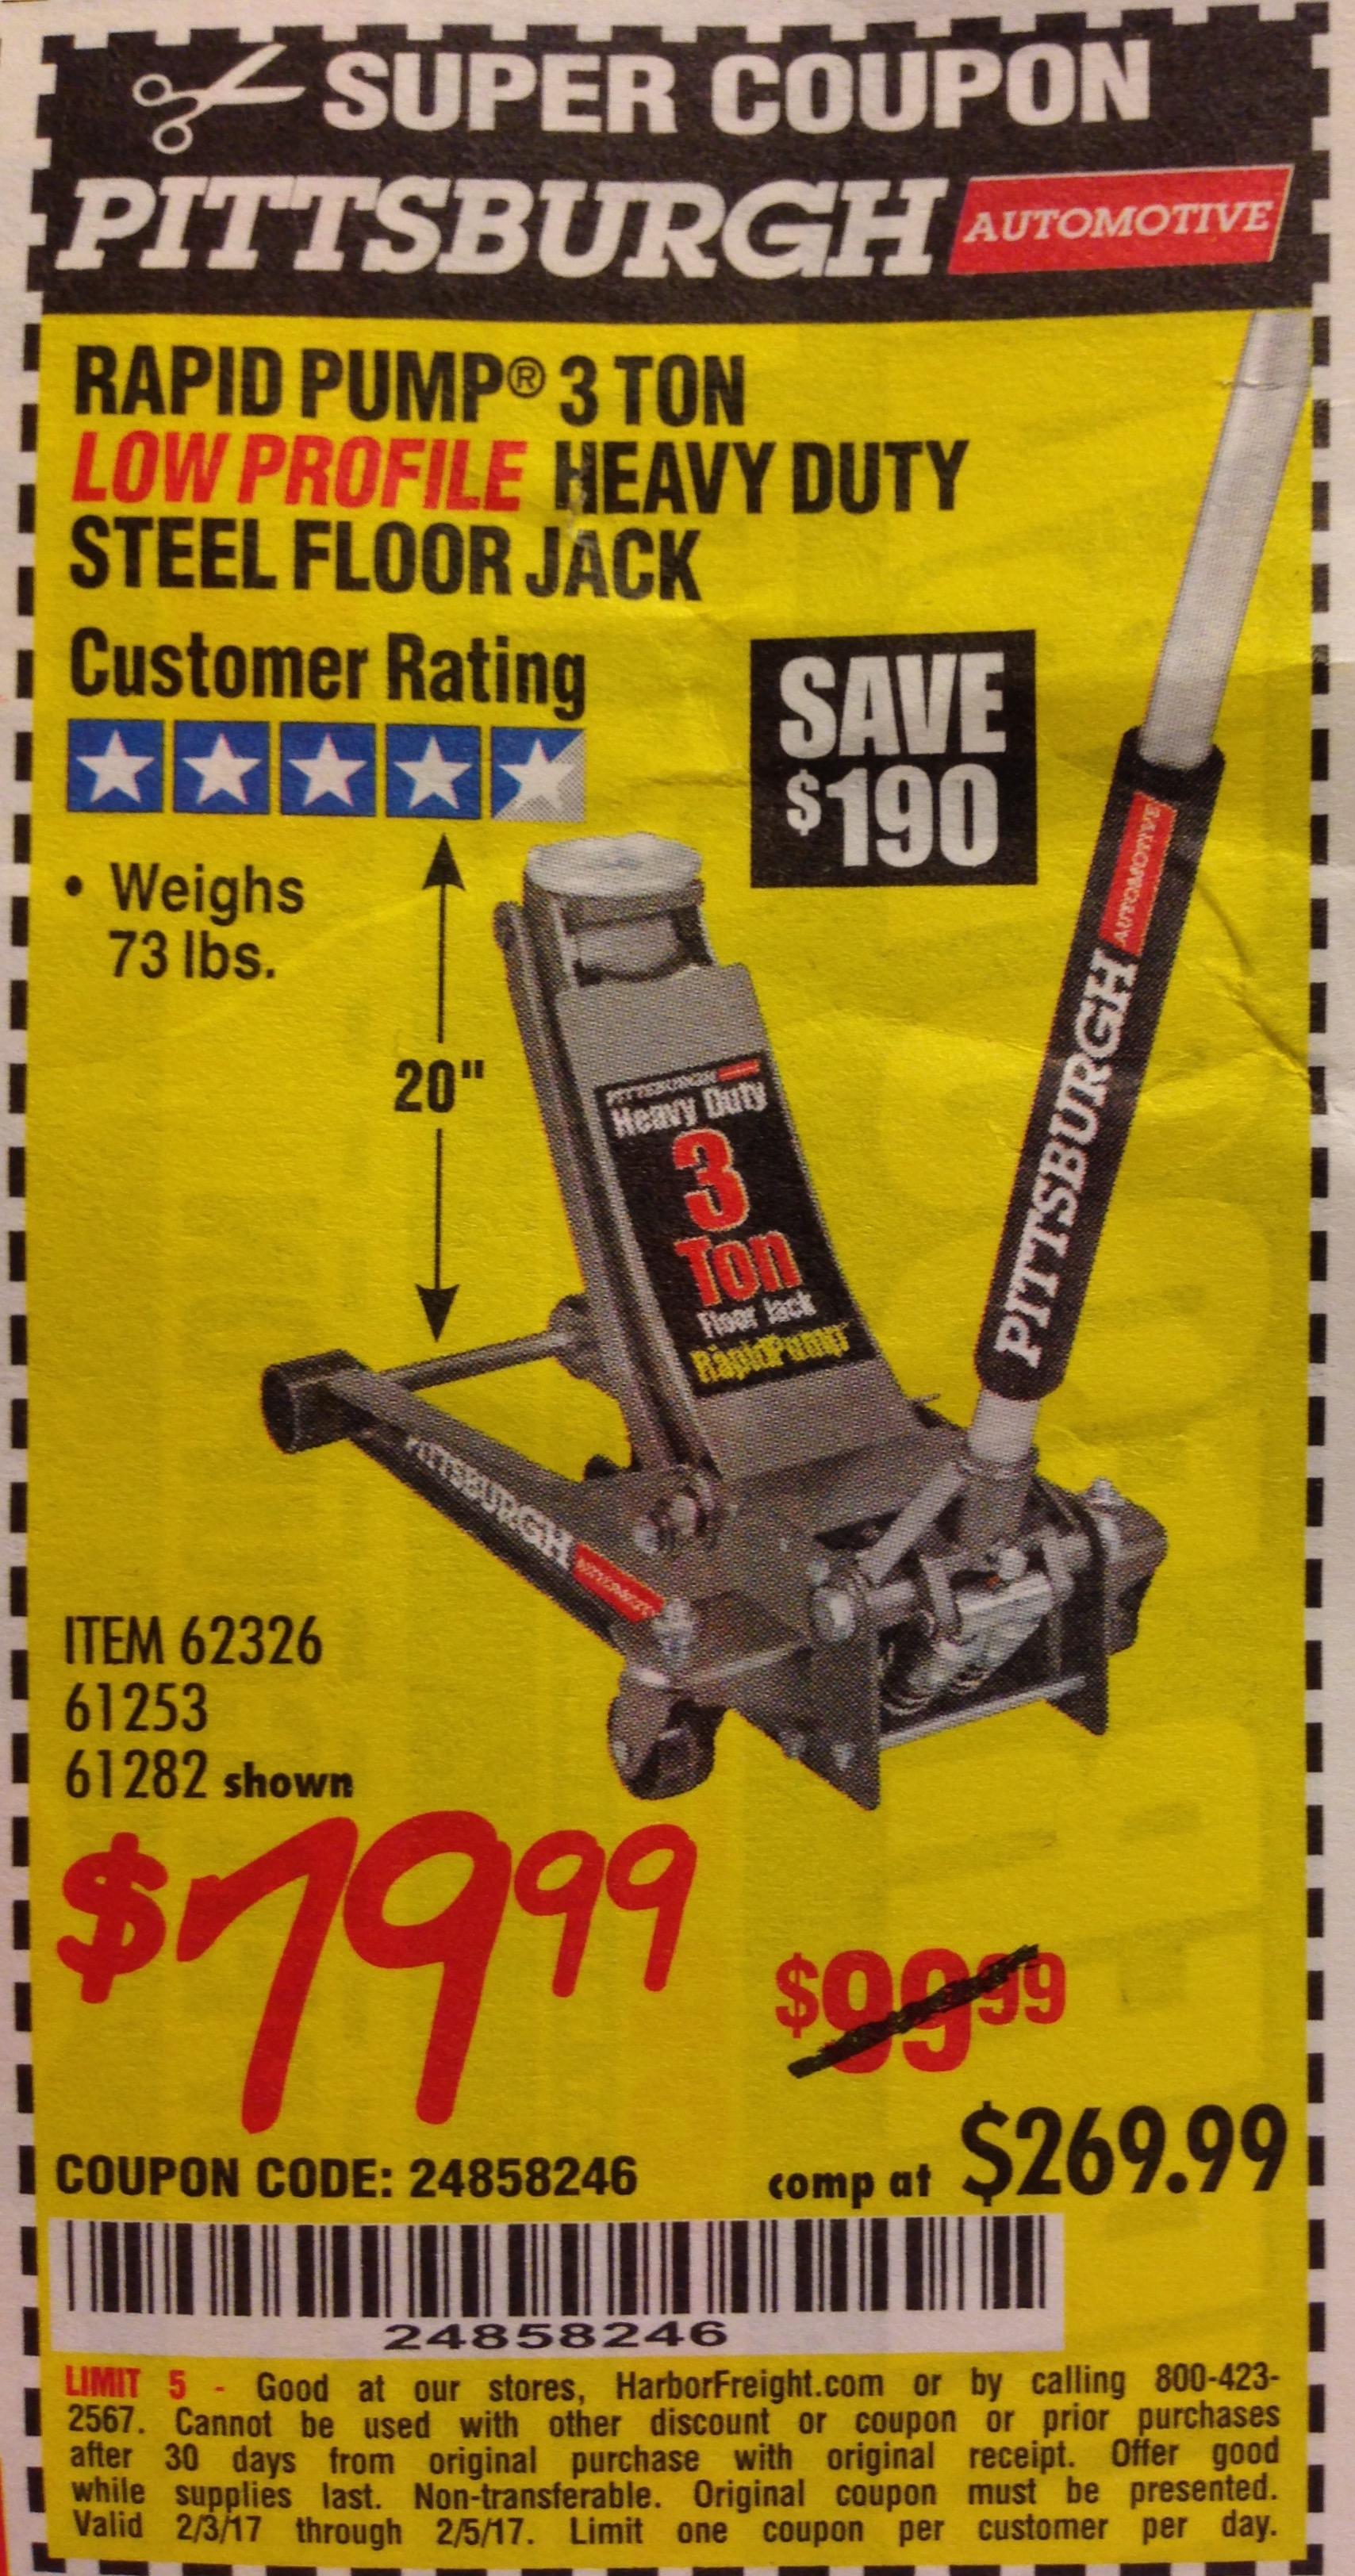 Jack astor's discount coupons